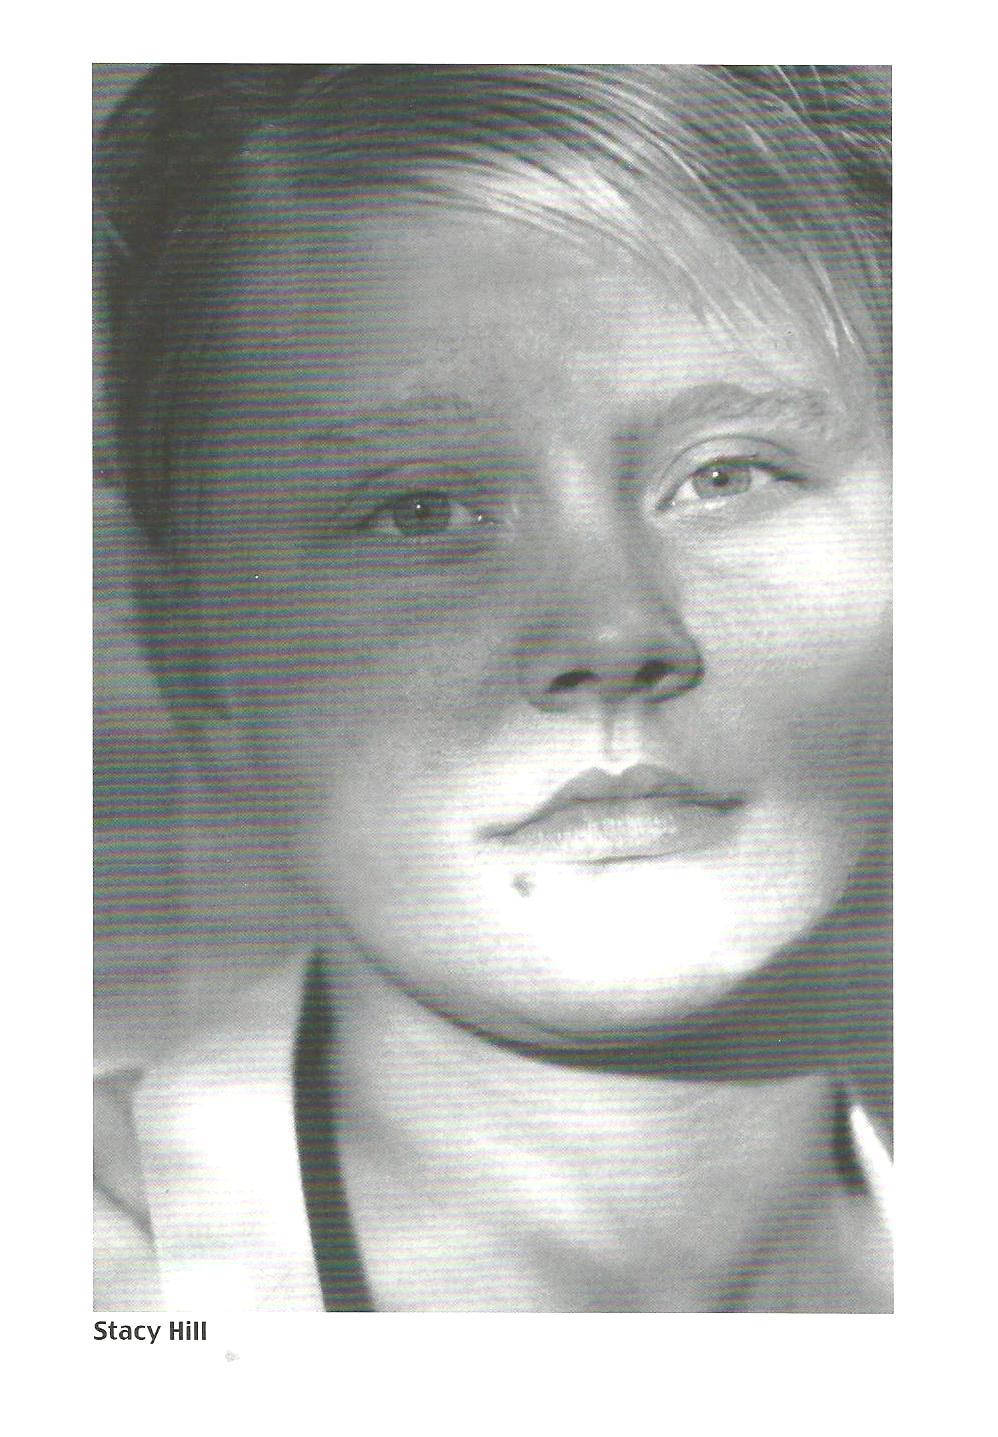 Stacy Hill 2001.jpg